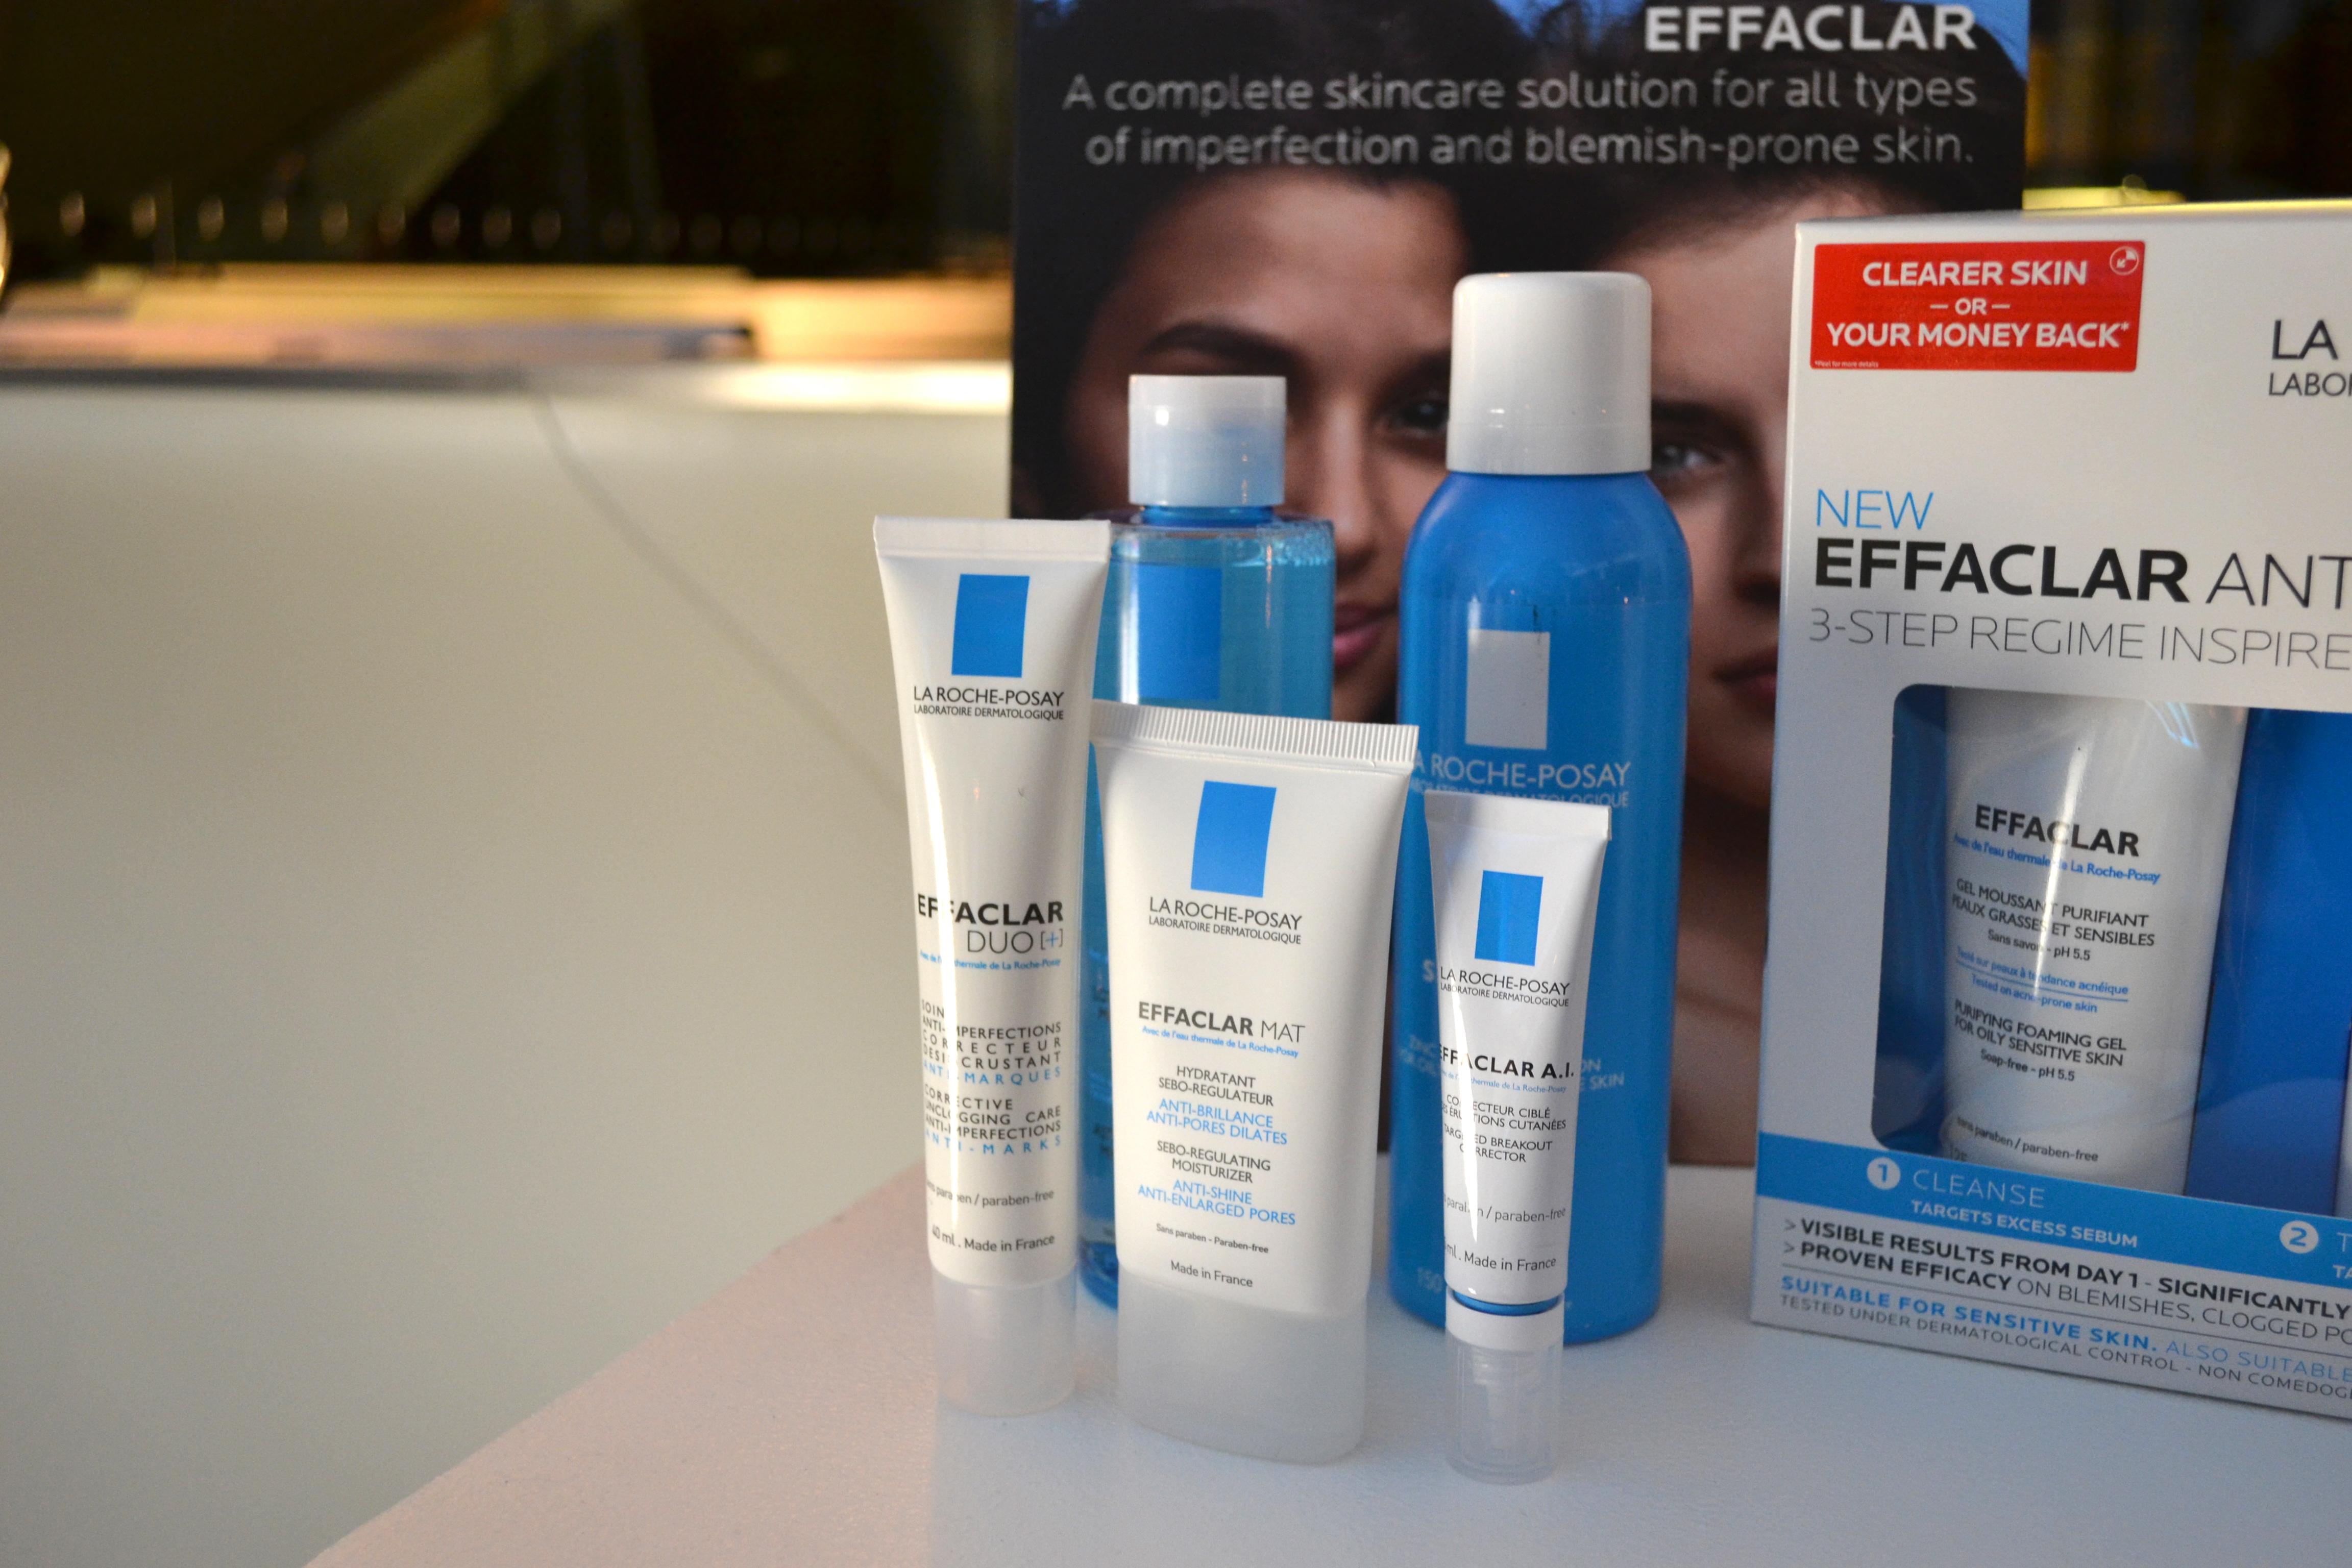 La Roche-Posay anti blemish gift set